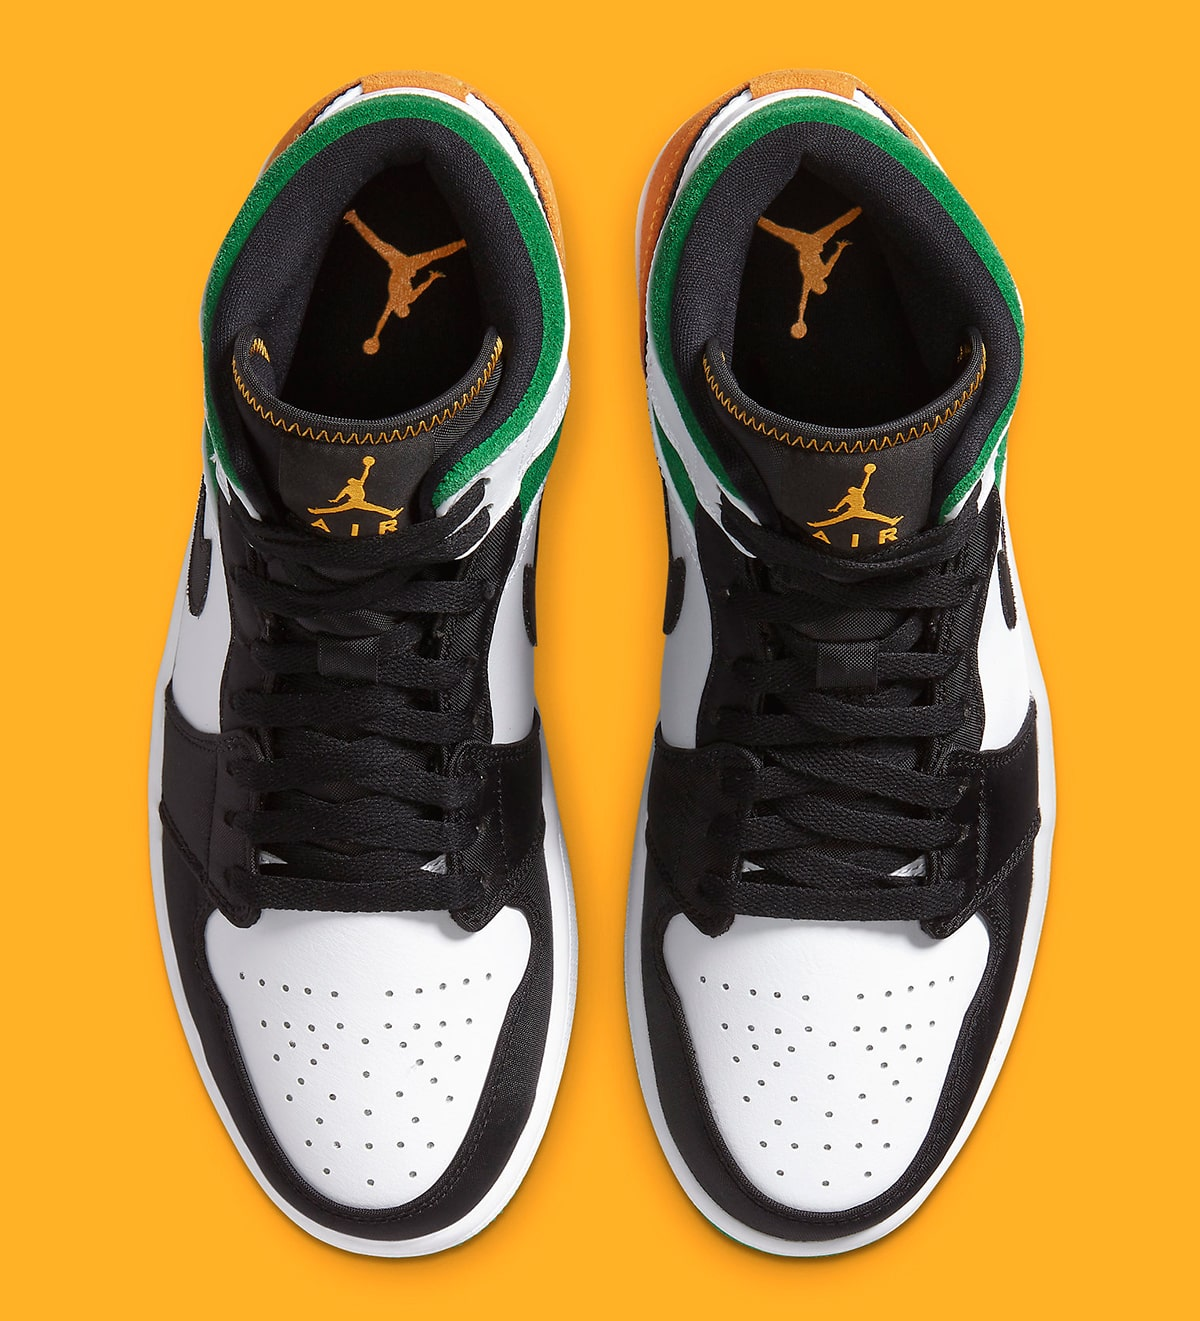 air-jordan-1-mid-se-white-black-green-laser-orange-852542-101-release-date-4